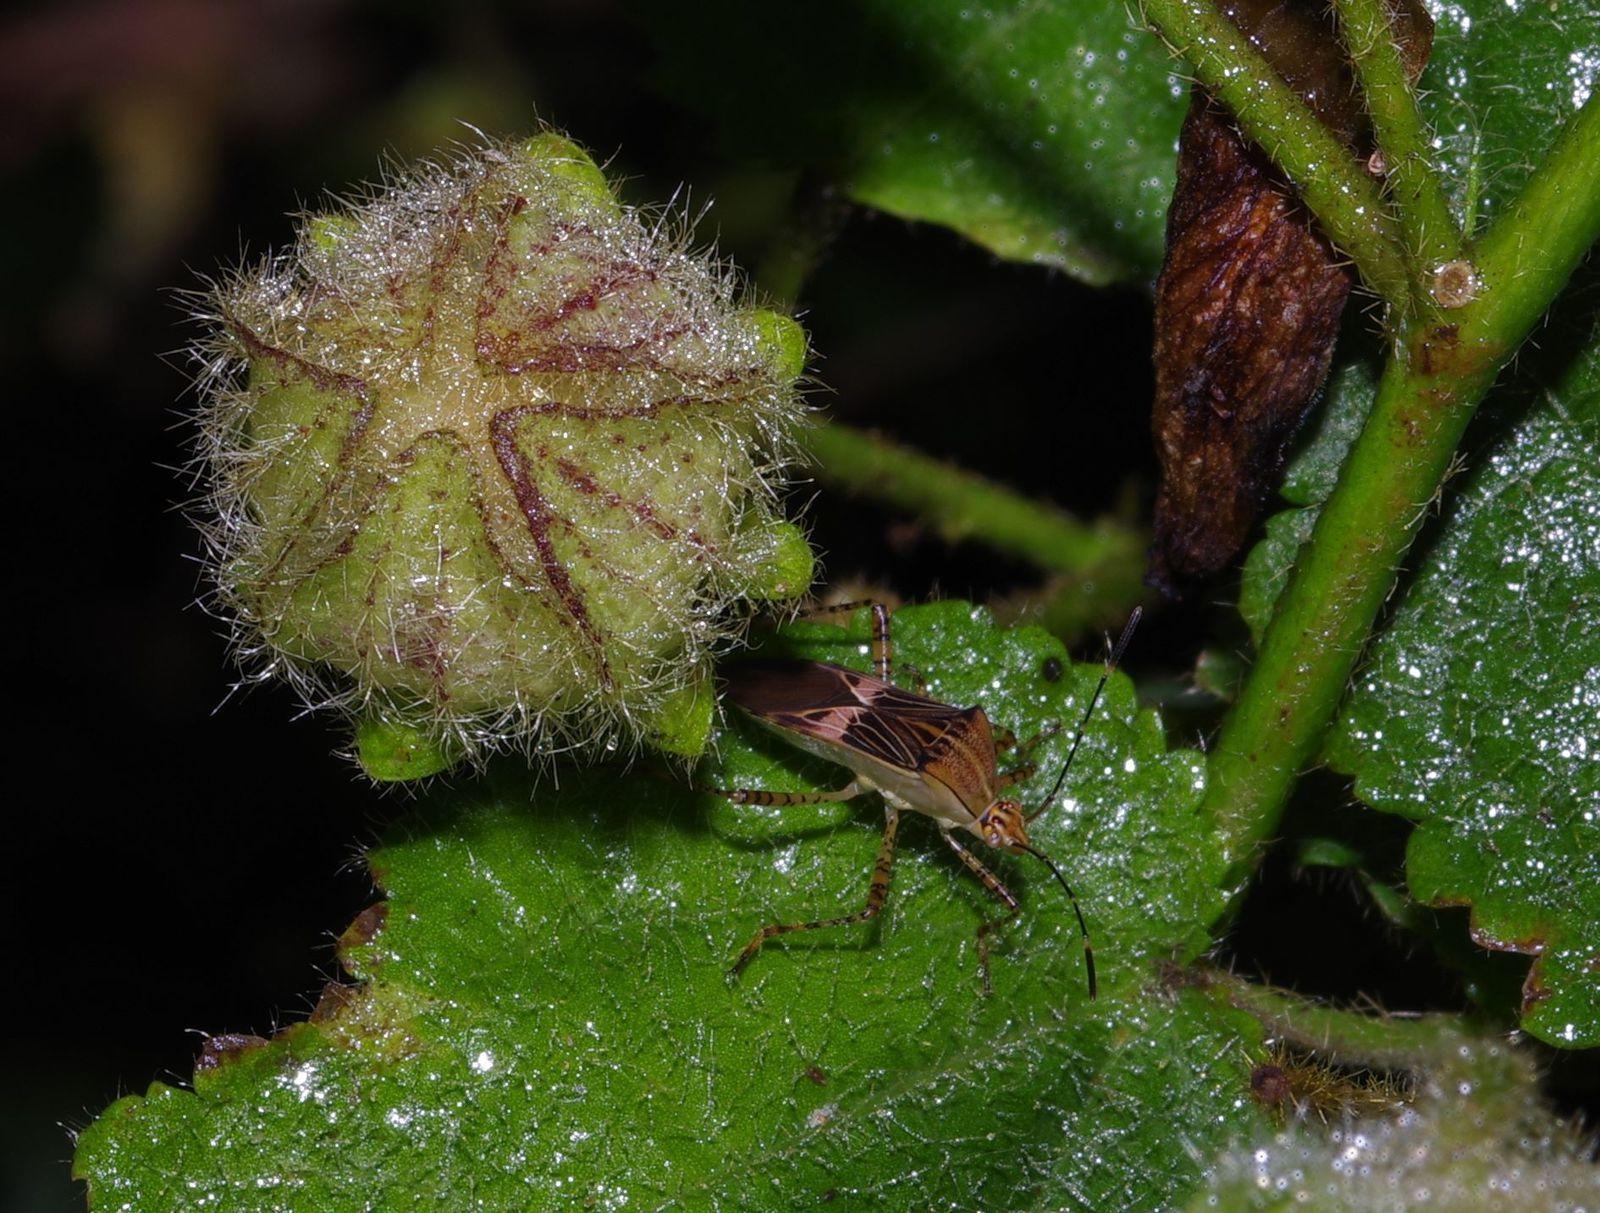 Hibiscus spathulatus